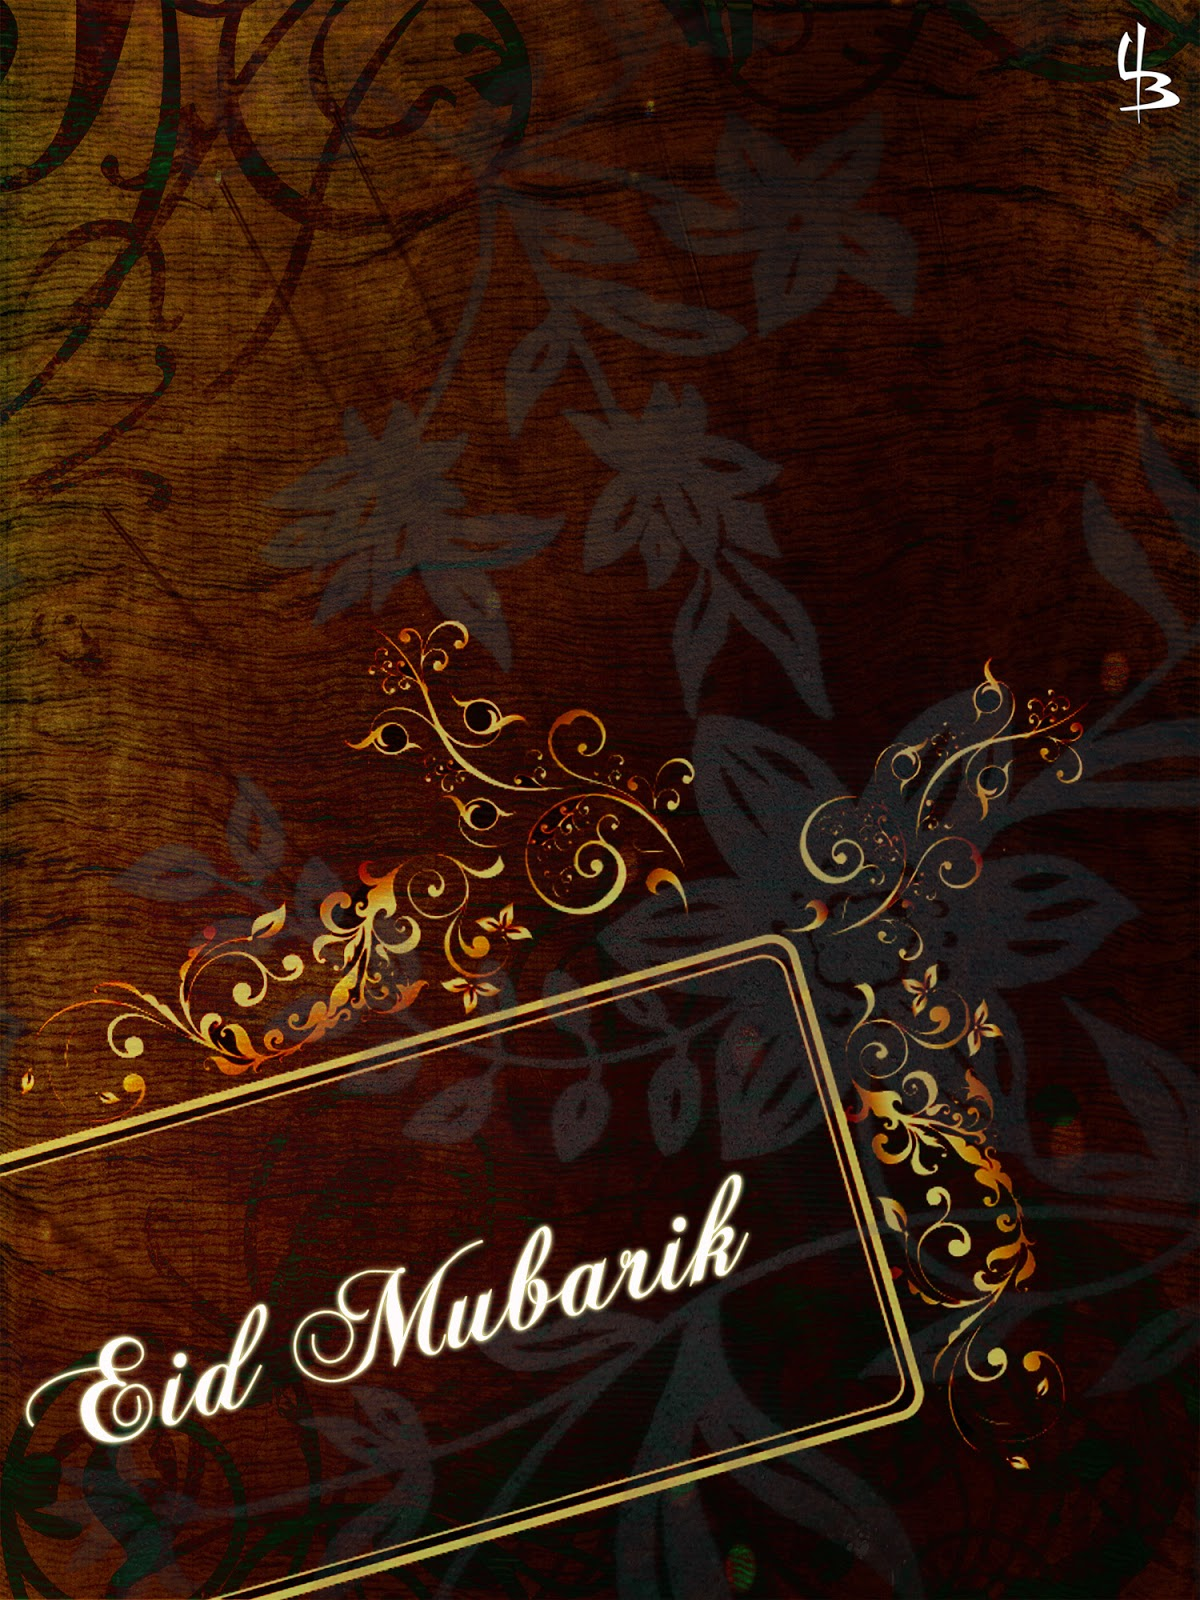 Wallpaper world eid mubarak greetings eid ul adhaazha mubarak muslim festival emotions greetings wishes kristyandbryce Choice Image